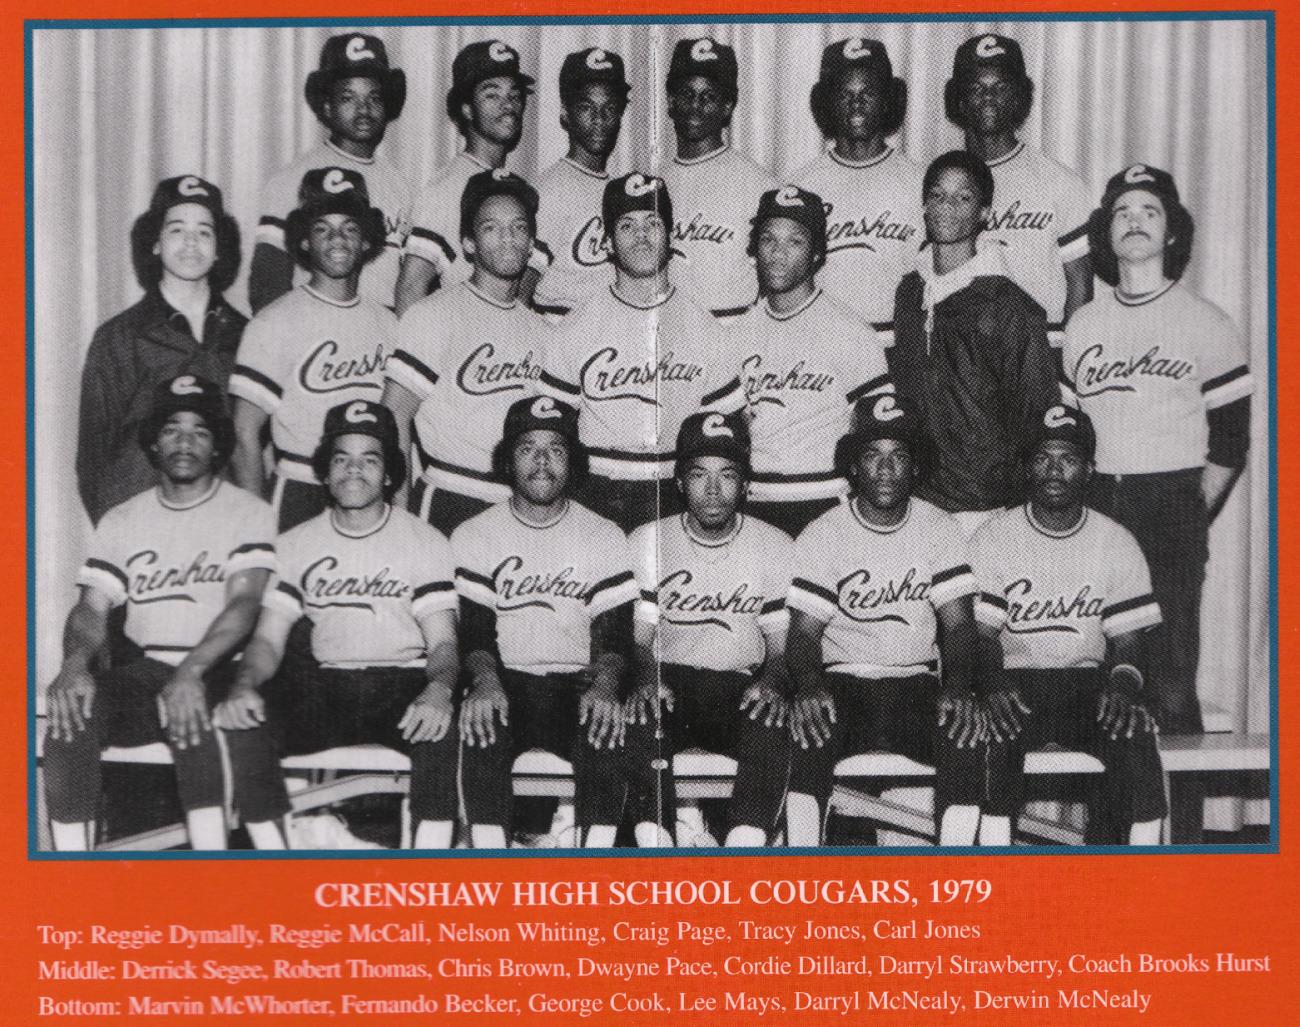 crenshawhscougars1979